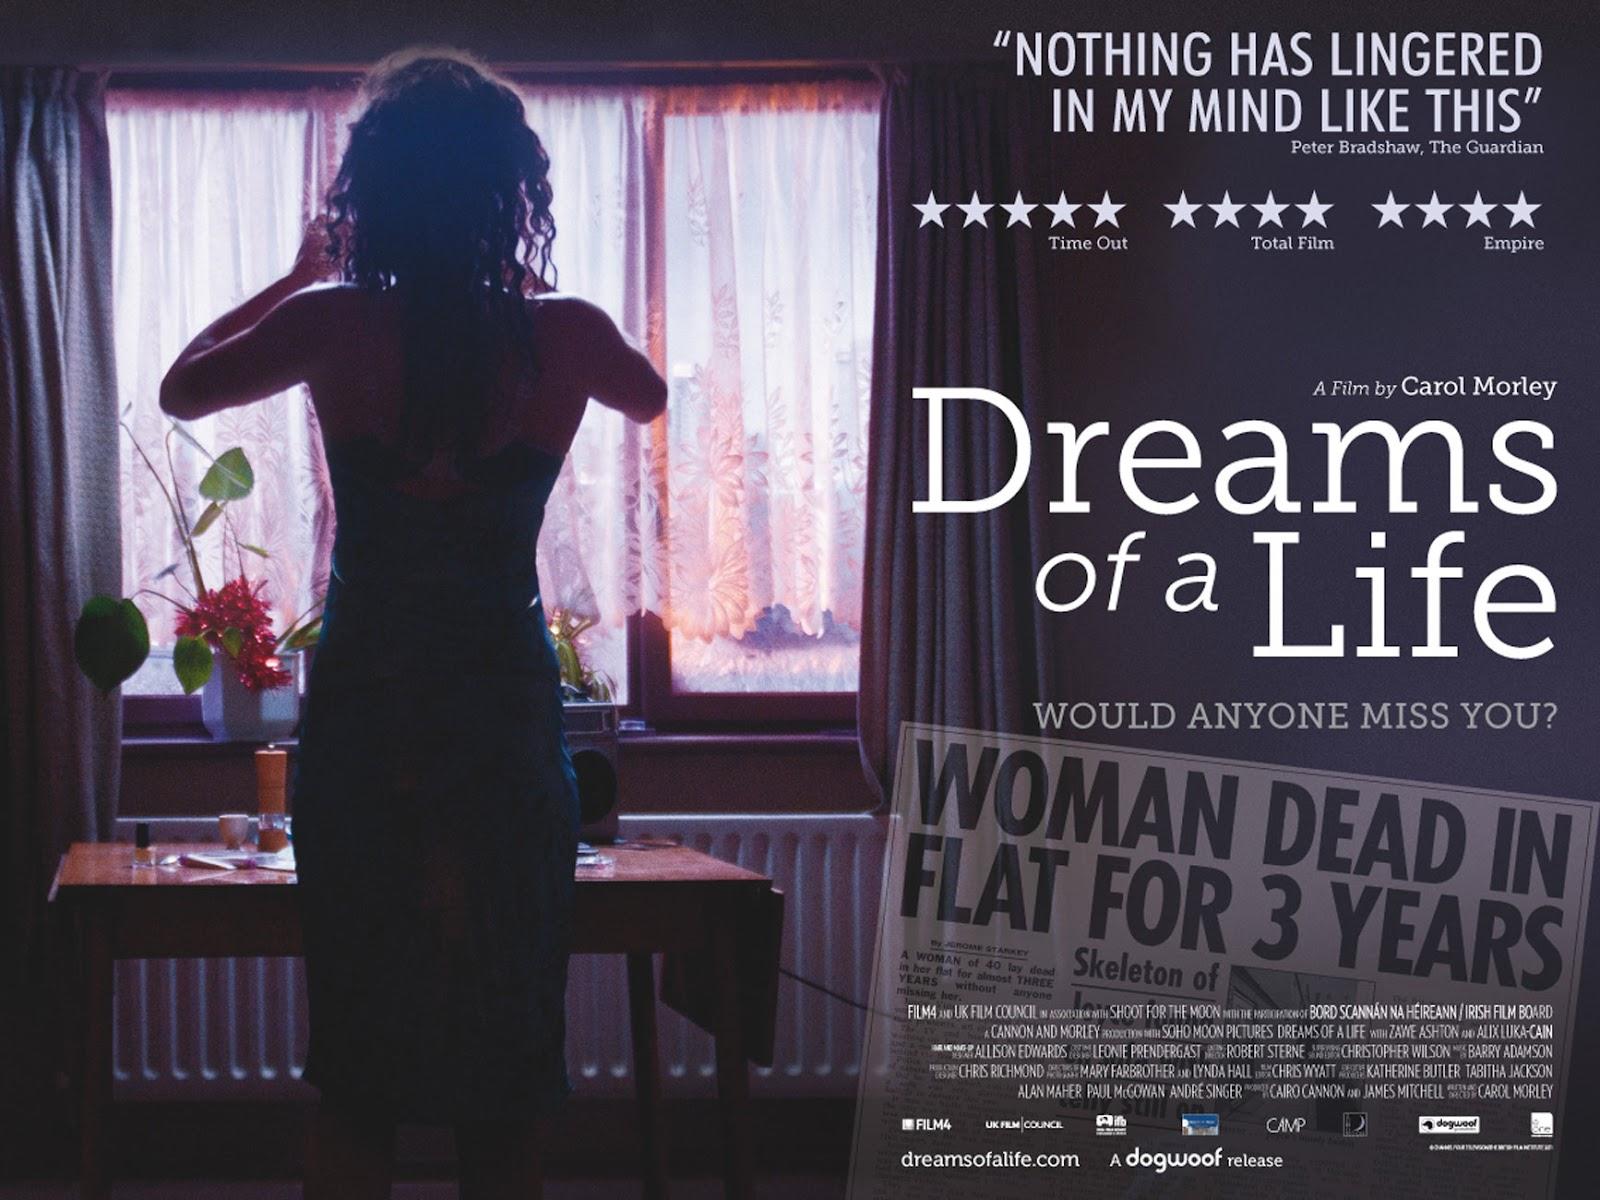 http://1.bp.blogspot.com/-2pm7lWTMZWk/Tyxhi8ofLLI/AAAAAAAADgk/Gj9lIUfJ7gI/s1600/dreams+of+a+life+poster.jpg